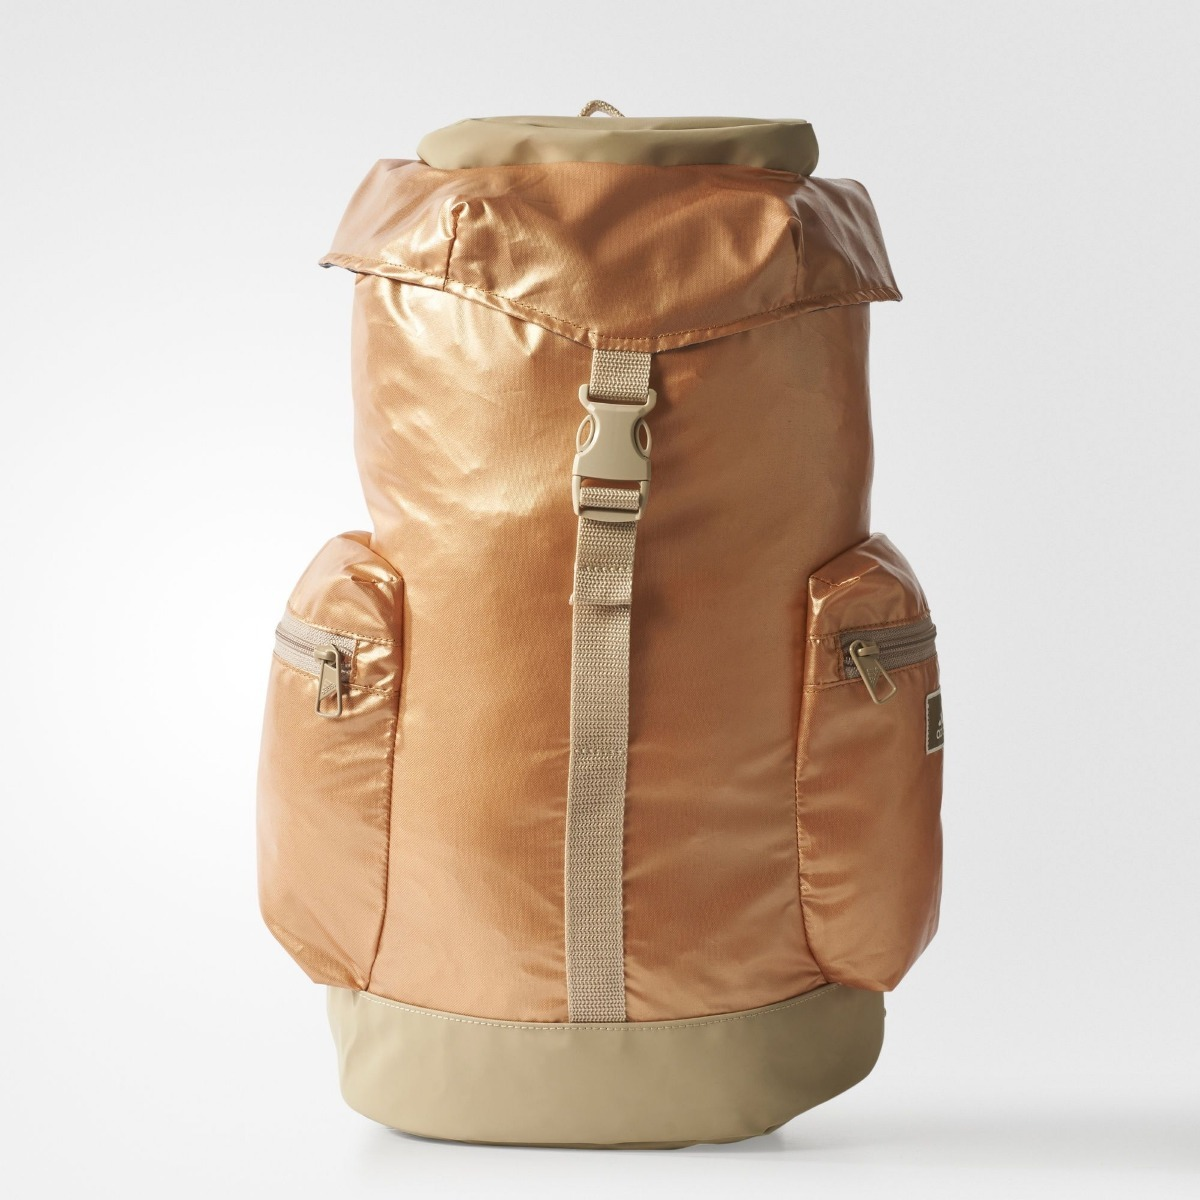 Backpack Wars Mochila Star Shop Adidas Originalsport 0N8wPXnOk